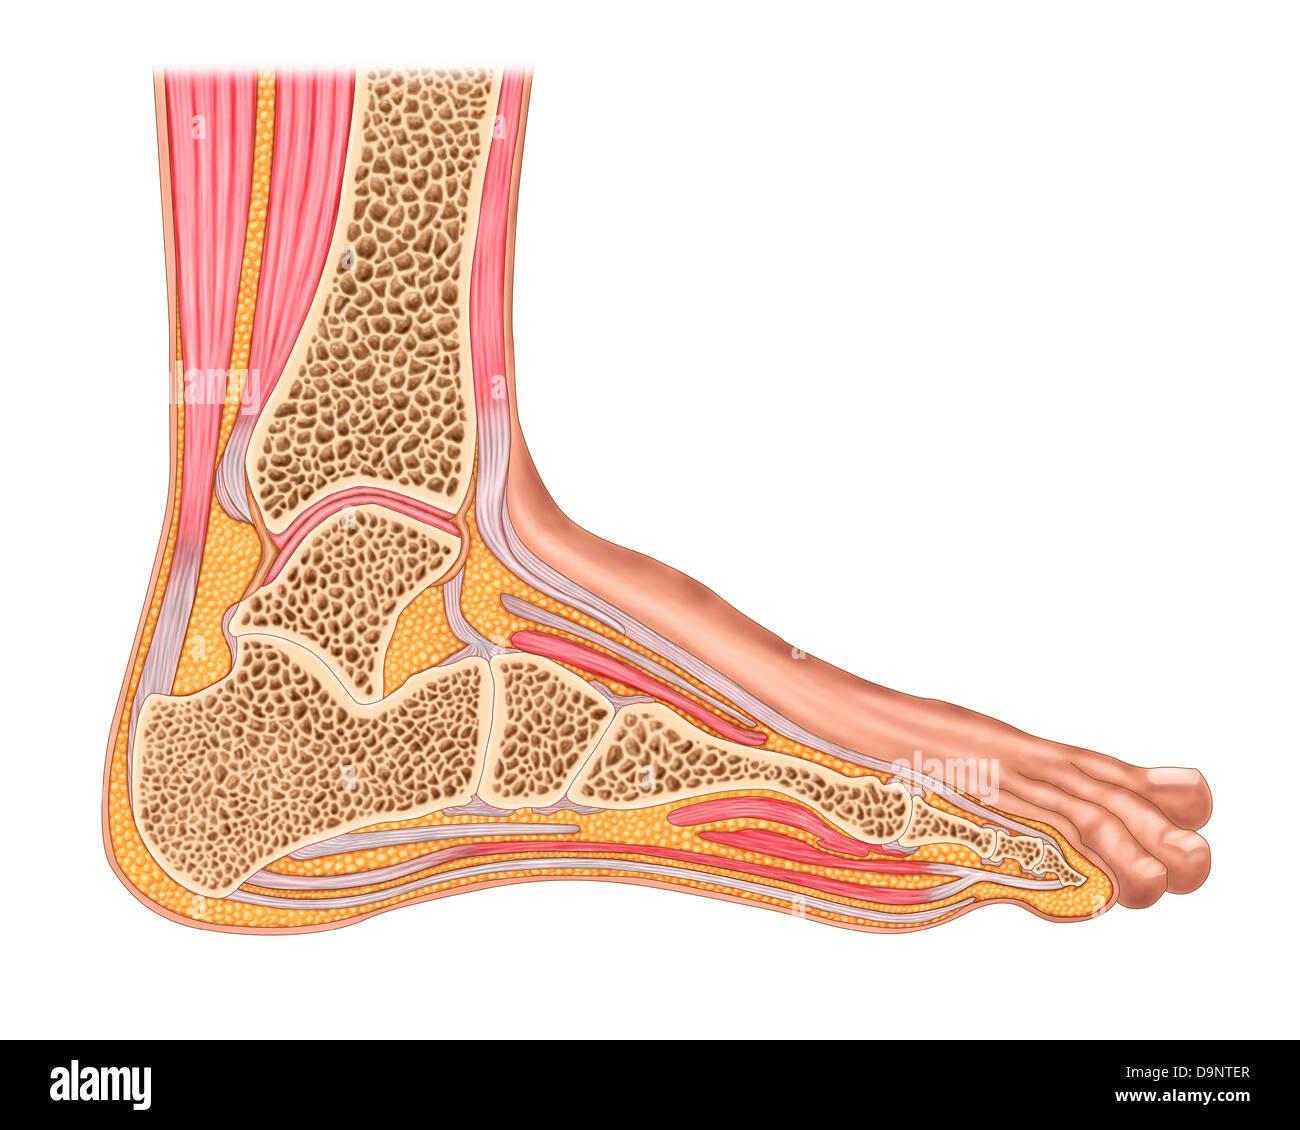 Foot Ligament Imágenes De Stock & Foot Ligament Fotos De Stock - Alamy